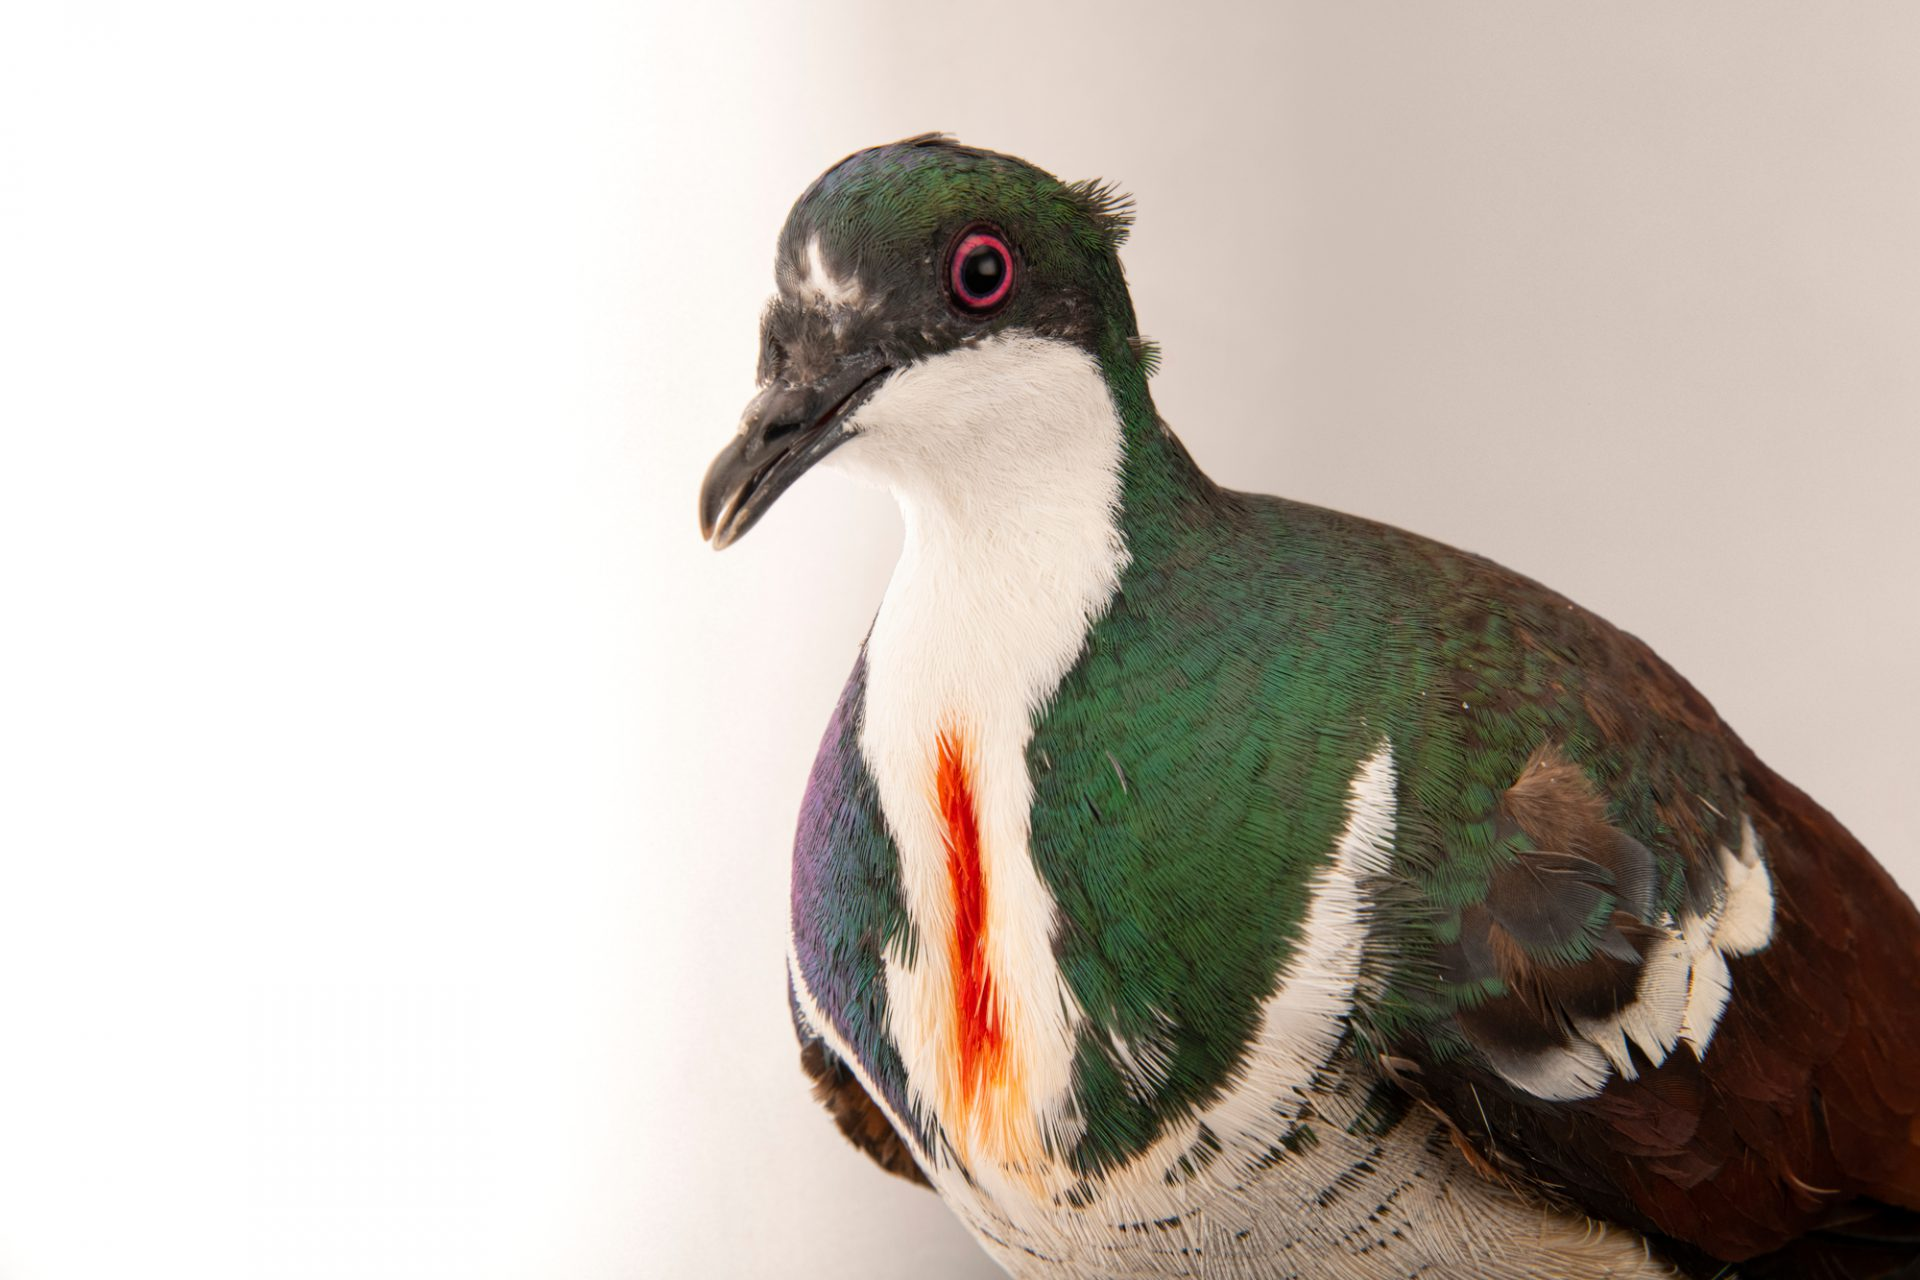 Photo: A critically endangered negros bleeding-heart pigeon, Gallicolumba keayi, at theTalarak Foundation.